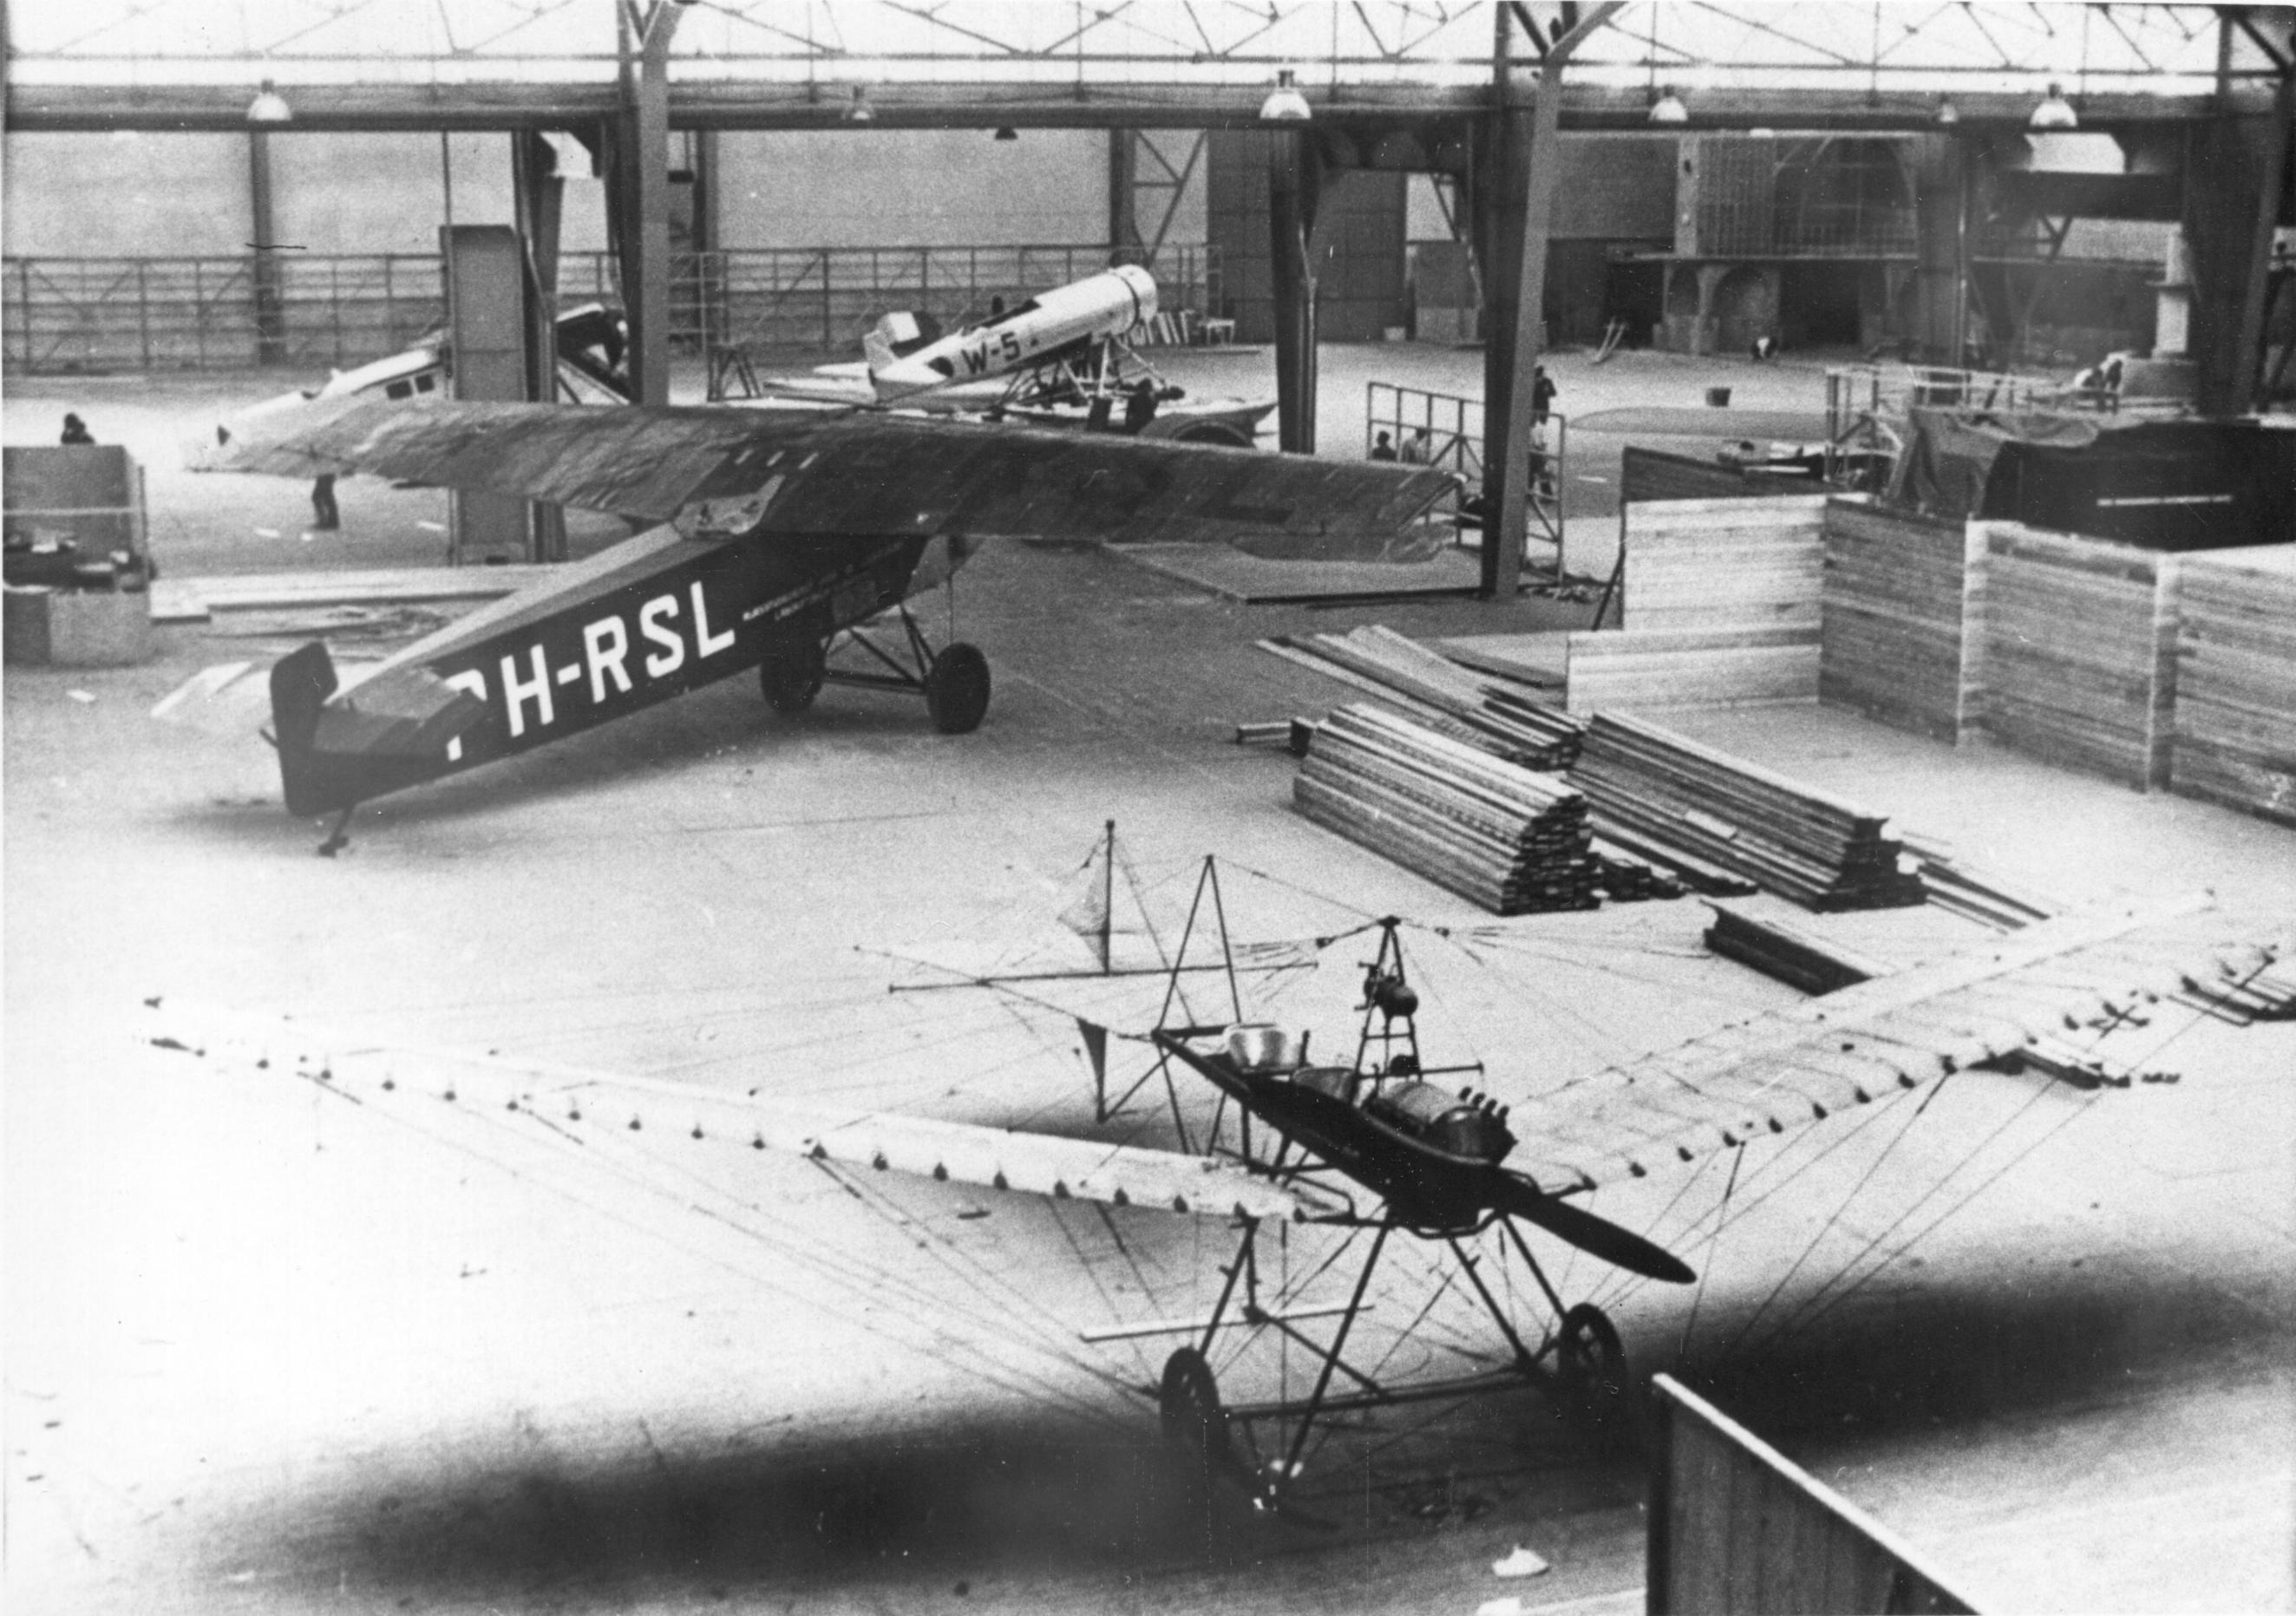 Naam: Schiphol 1939 FK26, C-11, F-7a, Spin via GJTORNIJ.jpg Bekeken: 127 Grootte: 515,8 KB